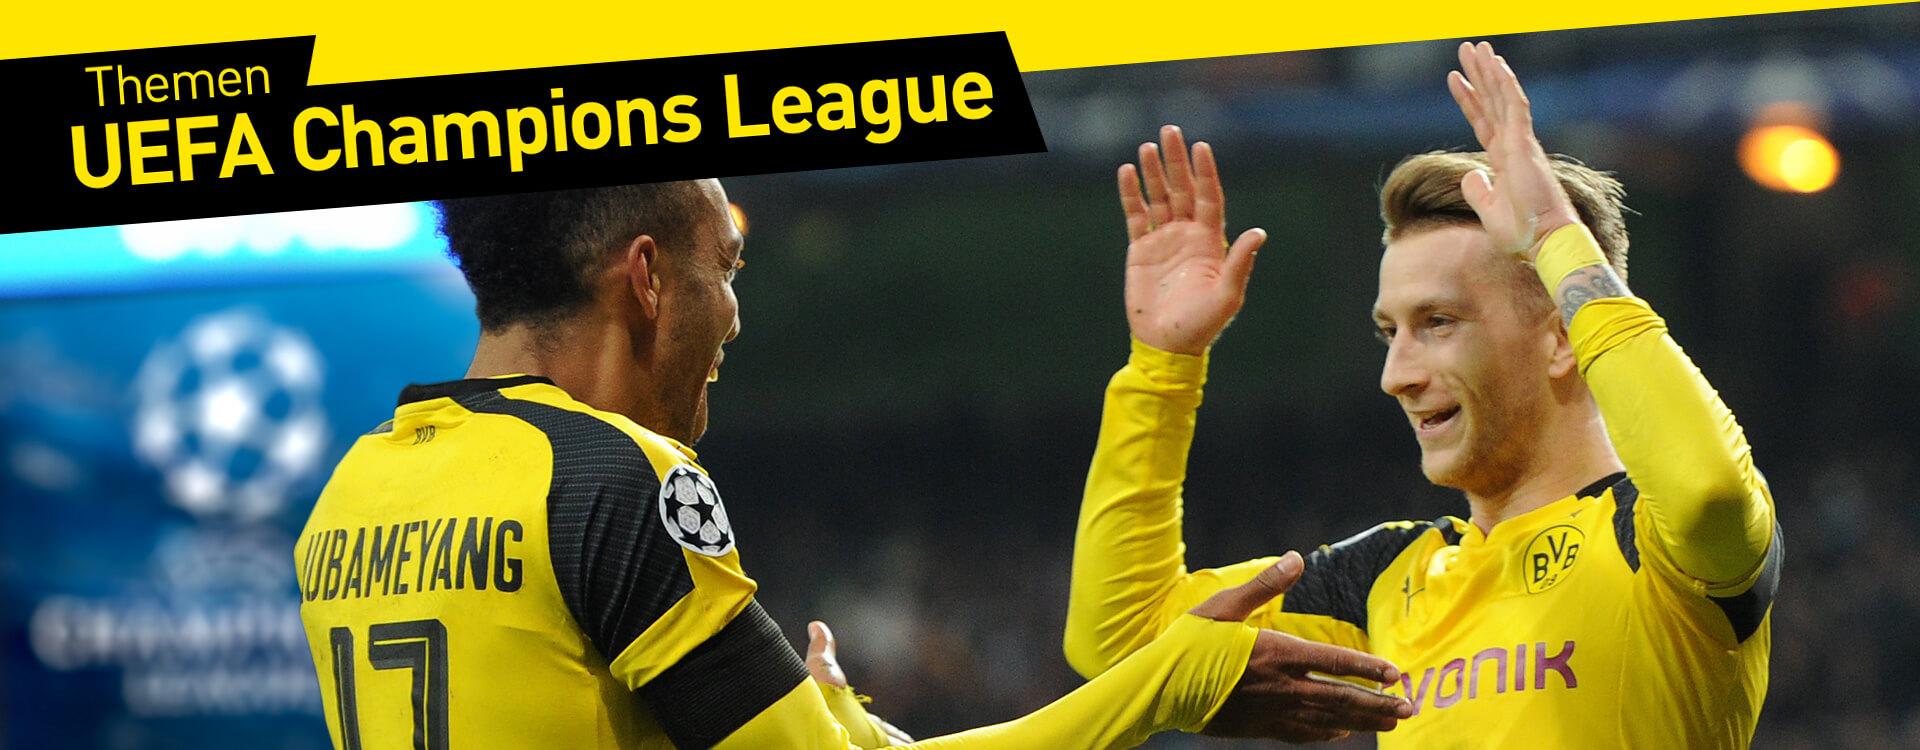 Themen-UEFA-Champions-League